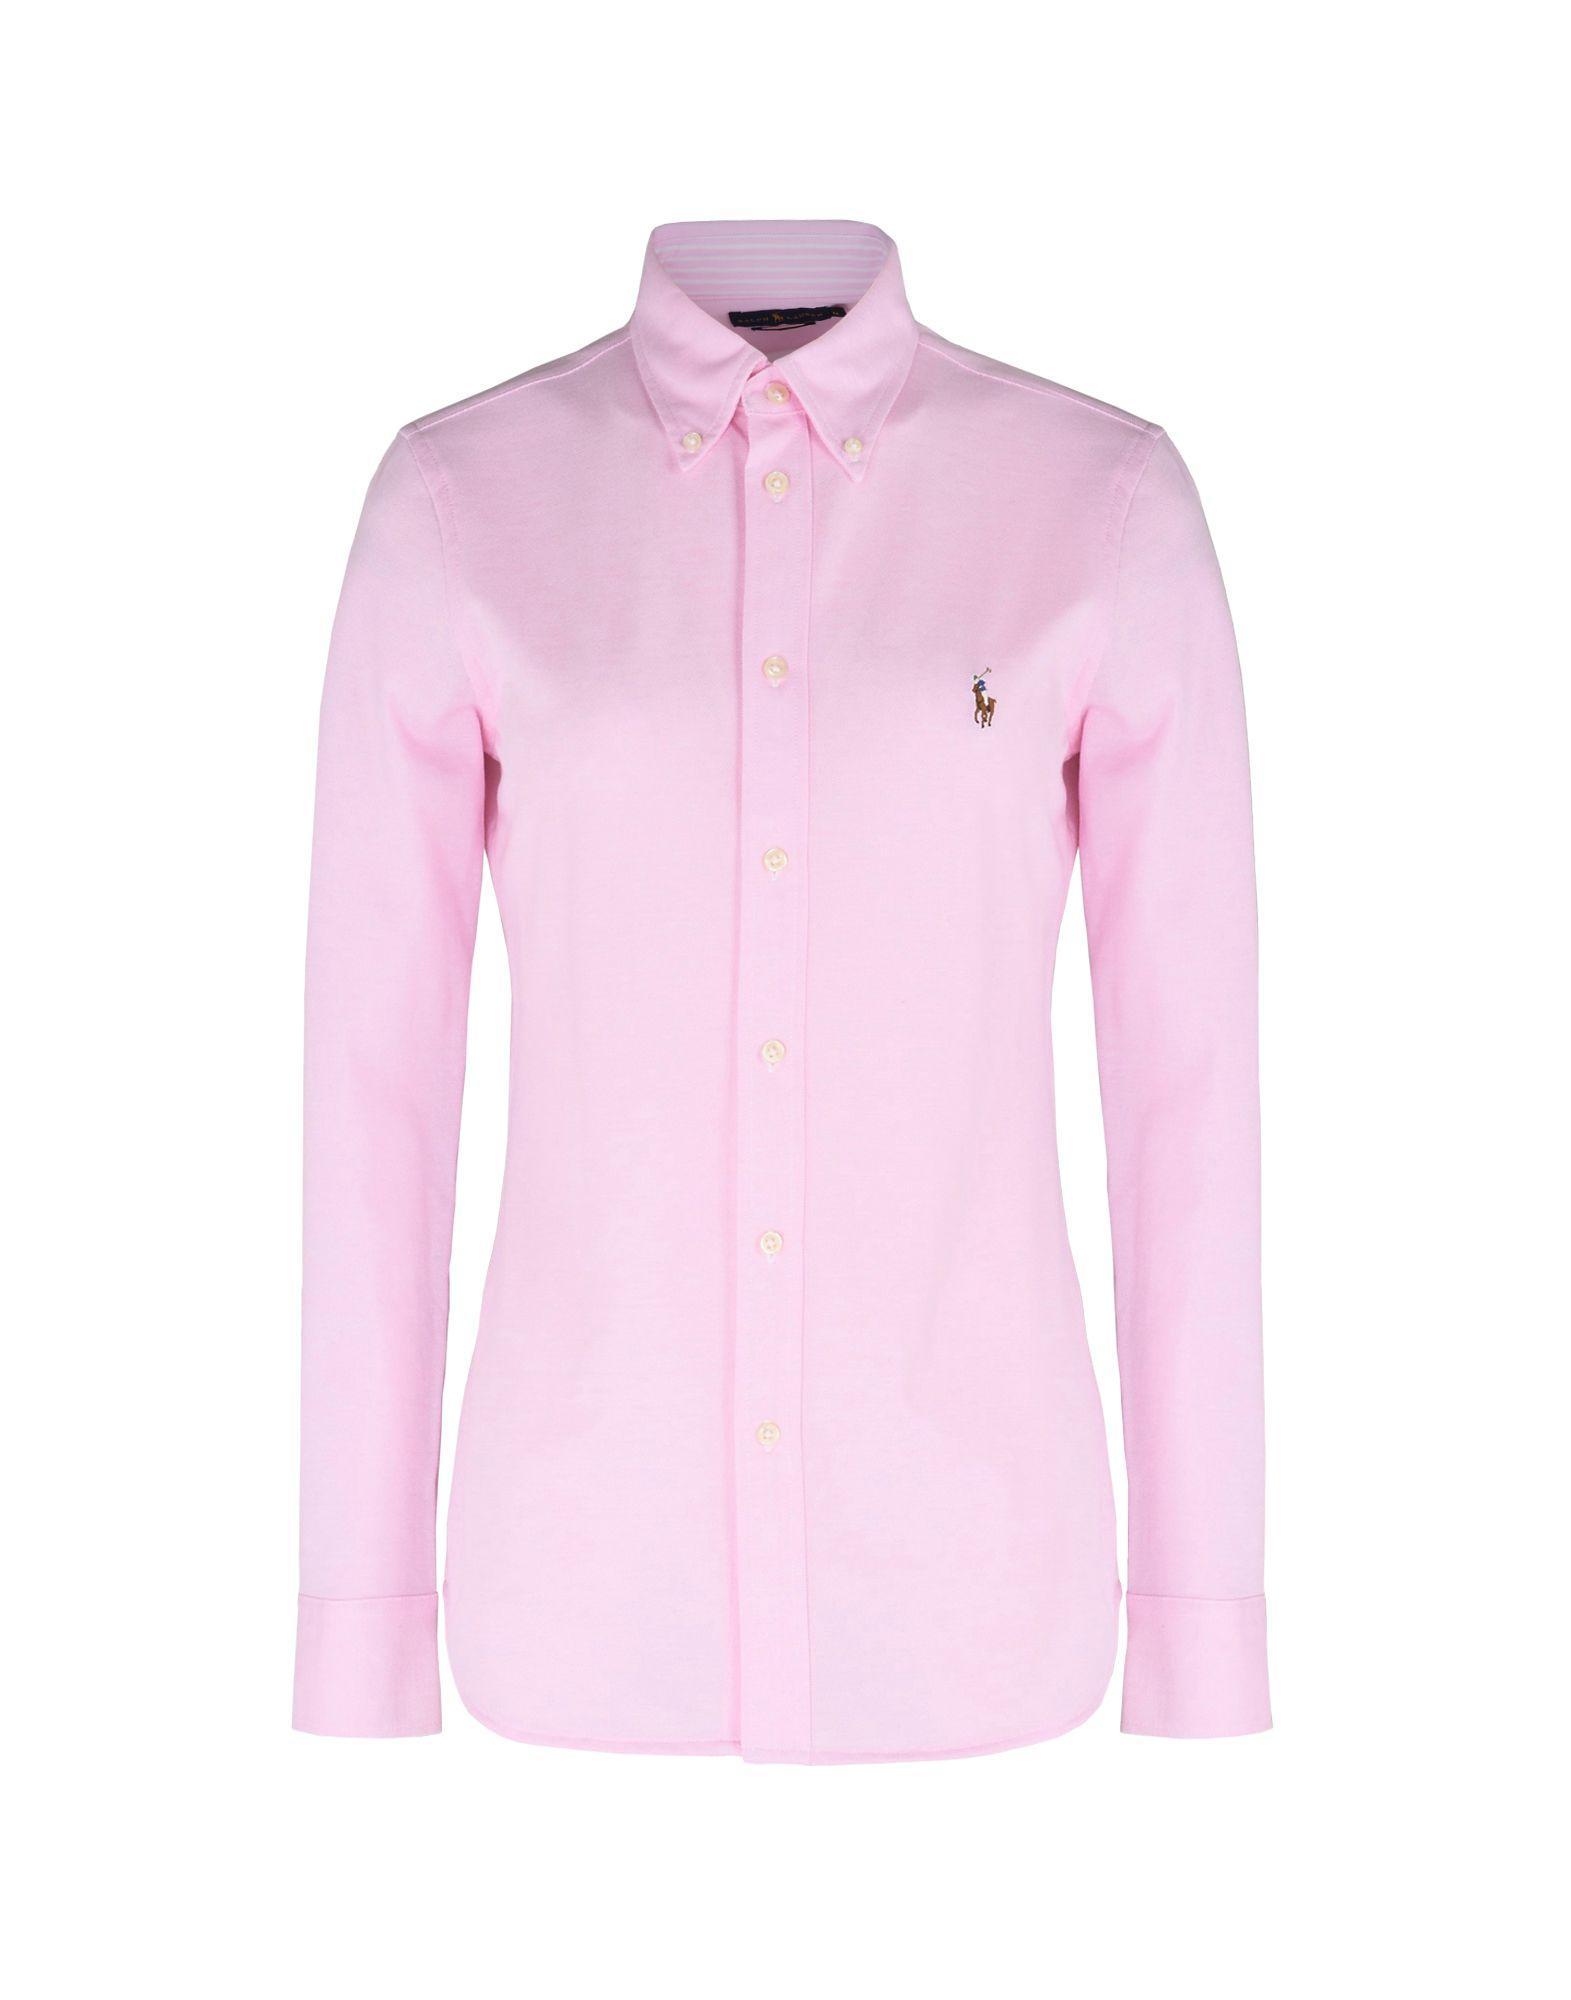 ab66304603336 Polo Ralph Lauren Slim Fit Knit Cotton Oxford Shirt - Solid Colour Shirts    Blouses - Women Polo Ralph Lauren Solid Colour Shirts   Blouses online on  YOOX ...